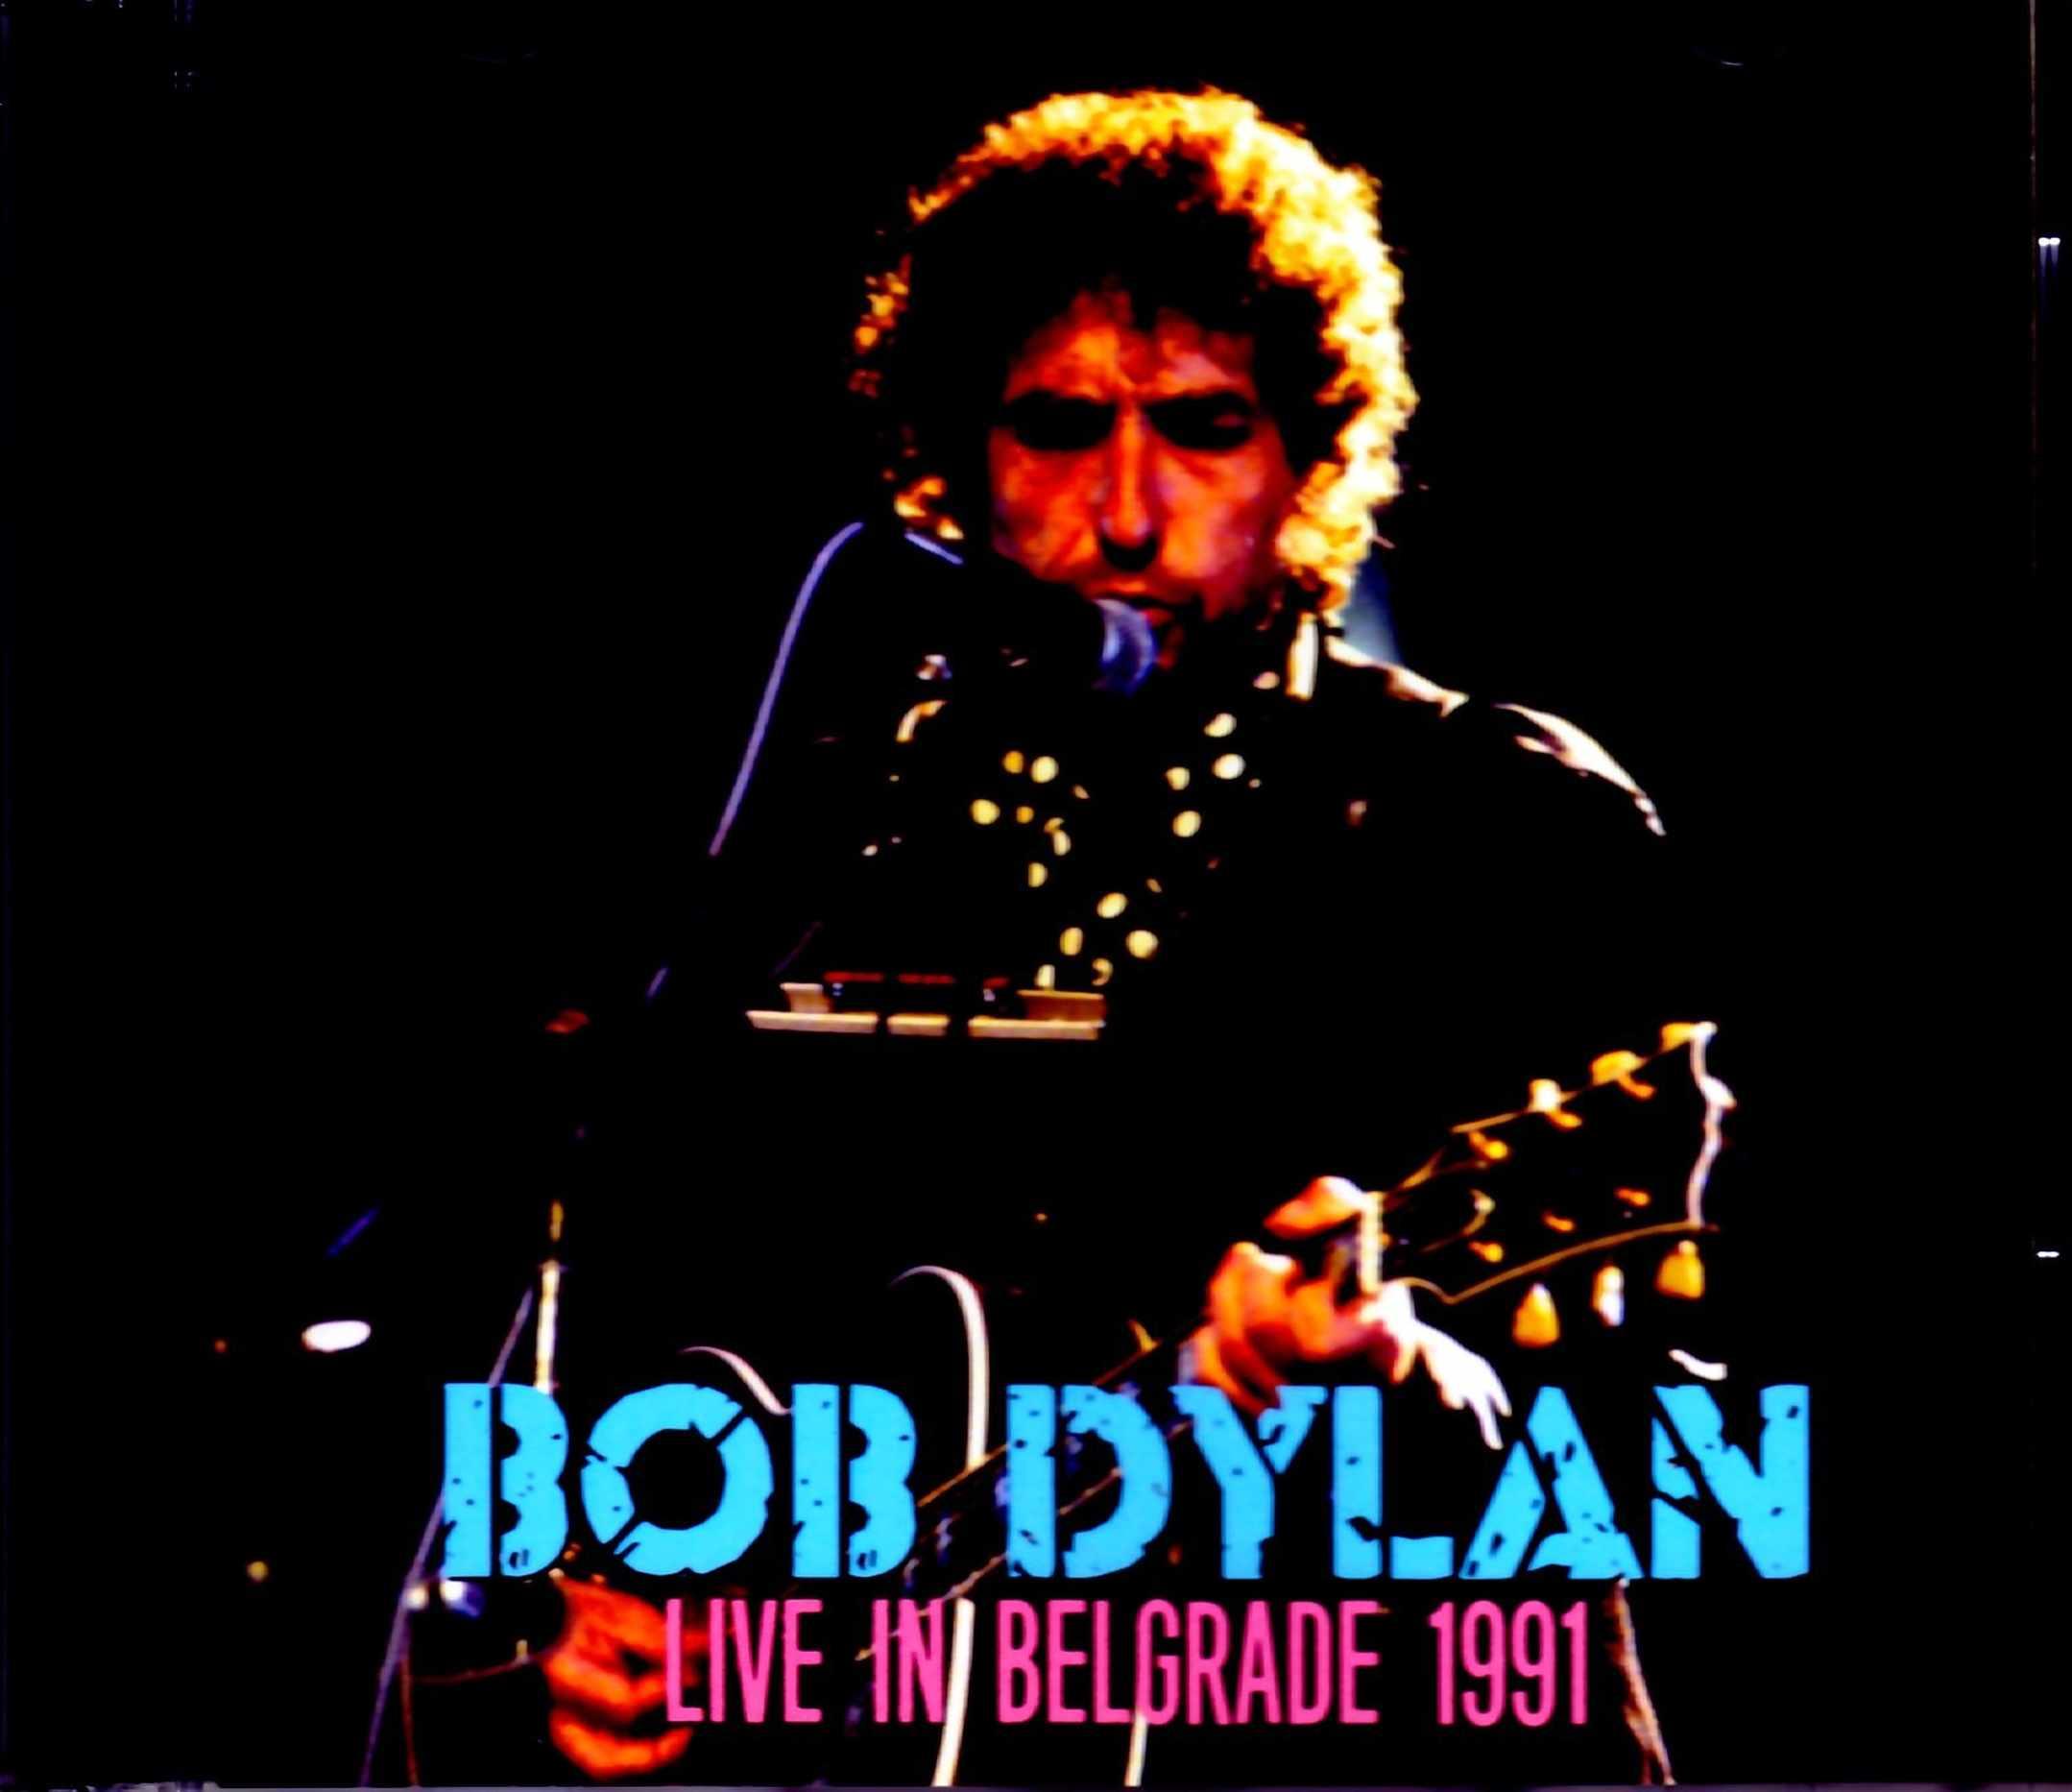 Bob Dylan ボブ・ディラン/Serbia 1991